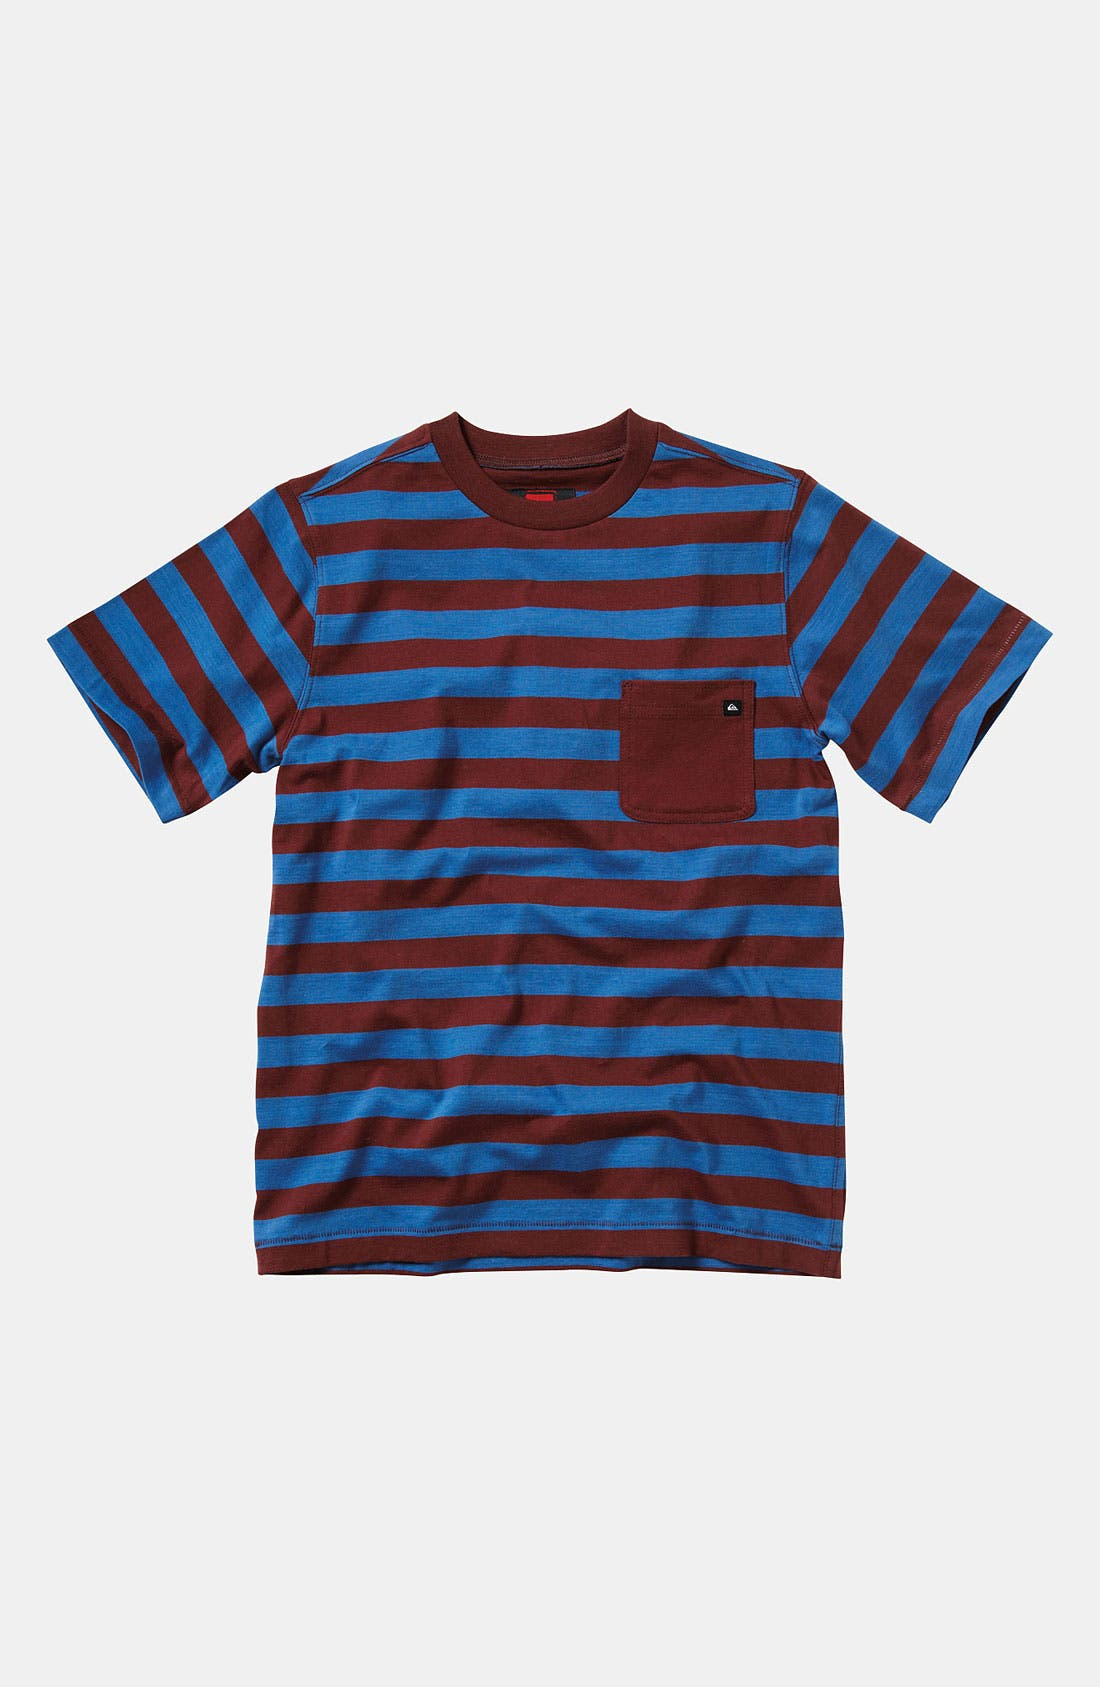 Alternate Image 1 Selected - Quiksilver 'Nolf' Crewneck T-Shirt (Big Boys)